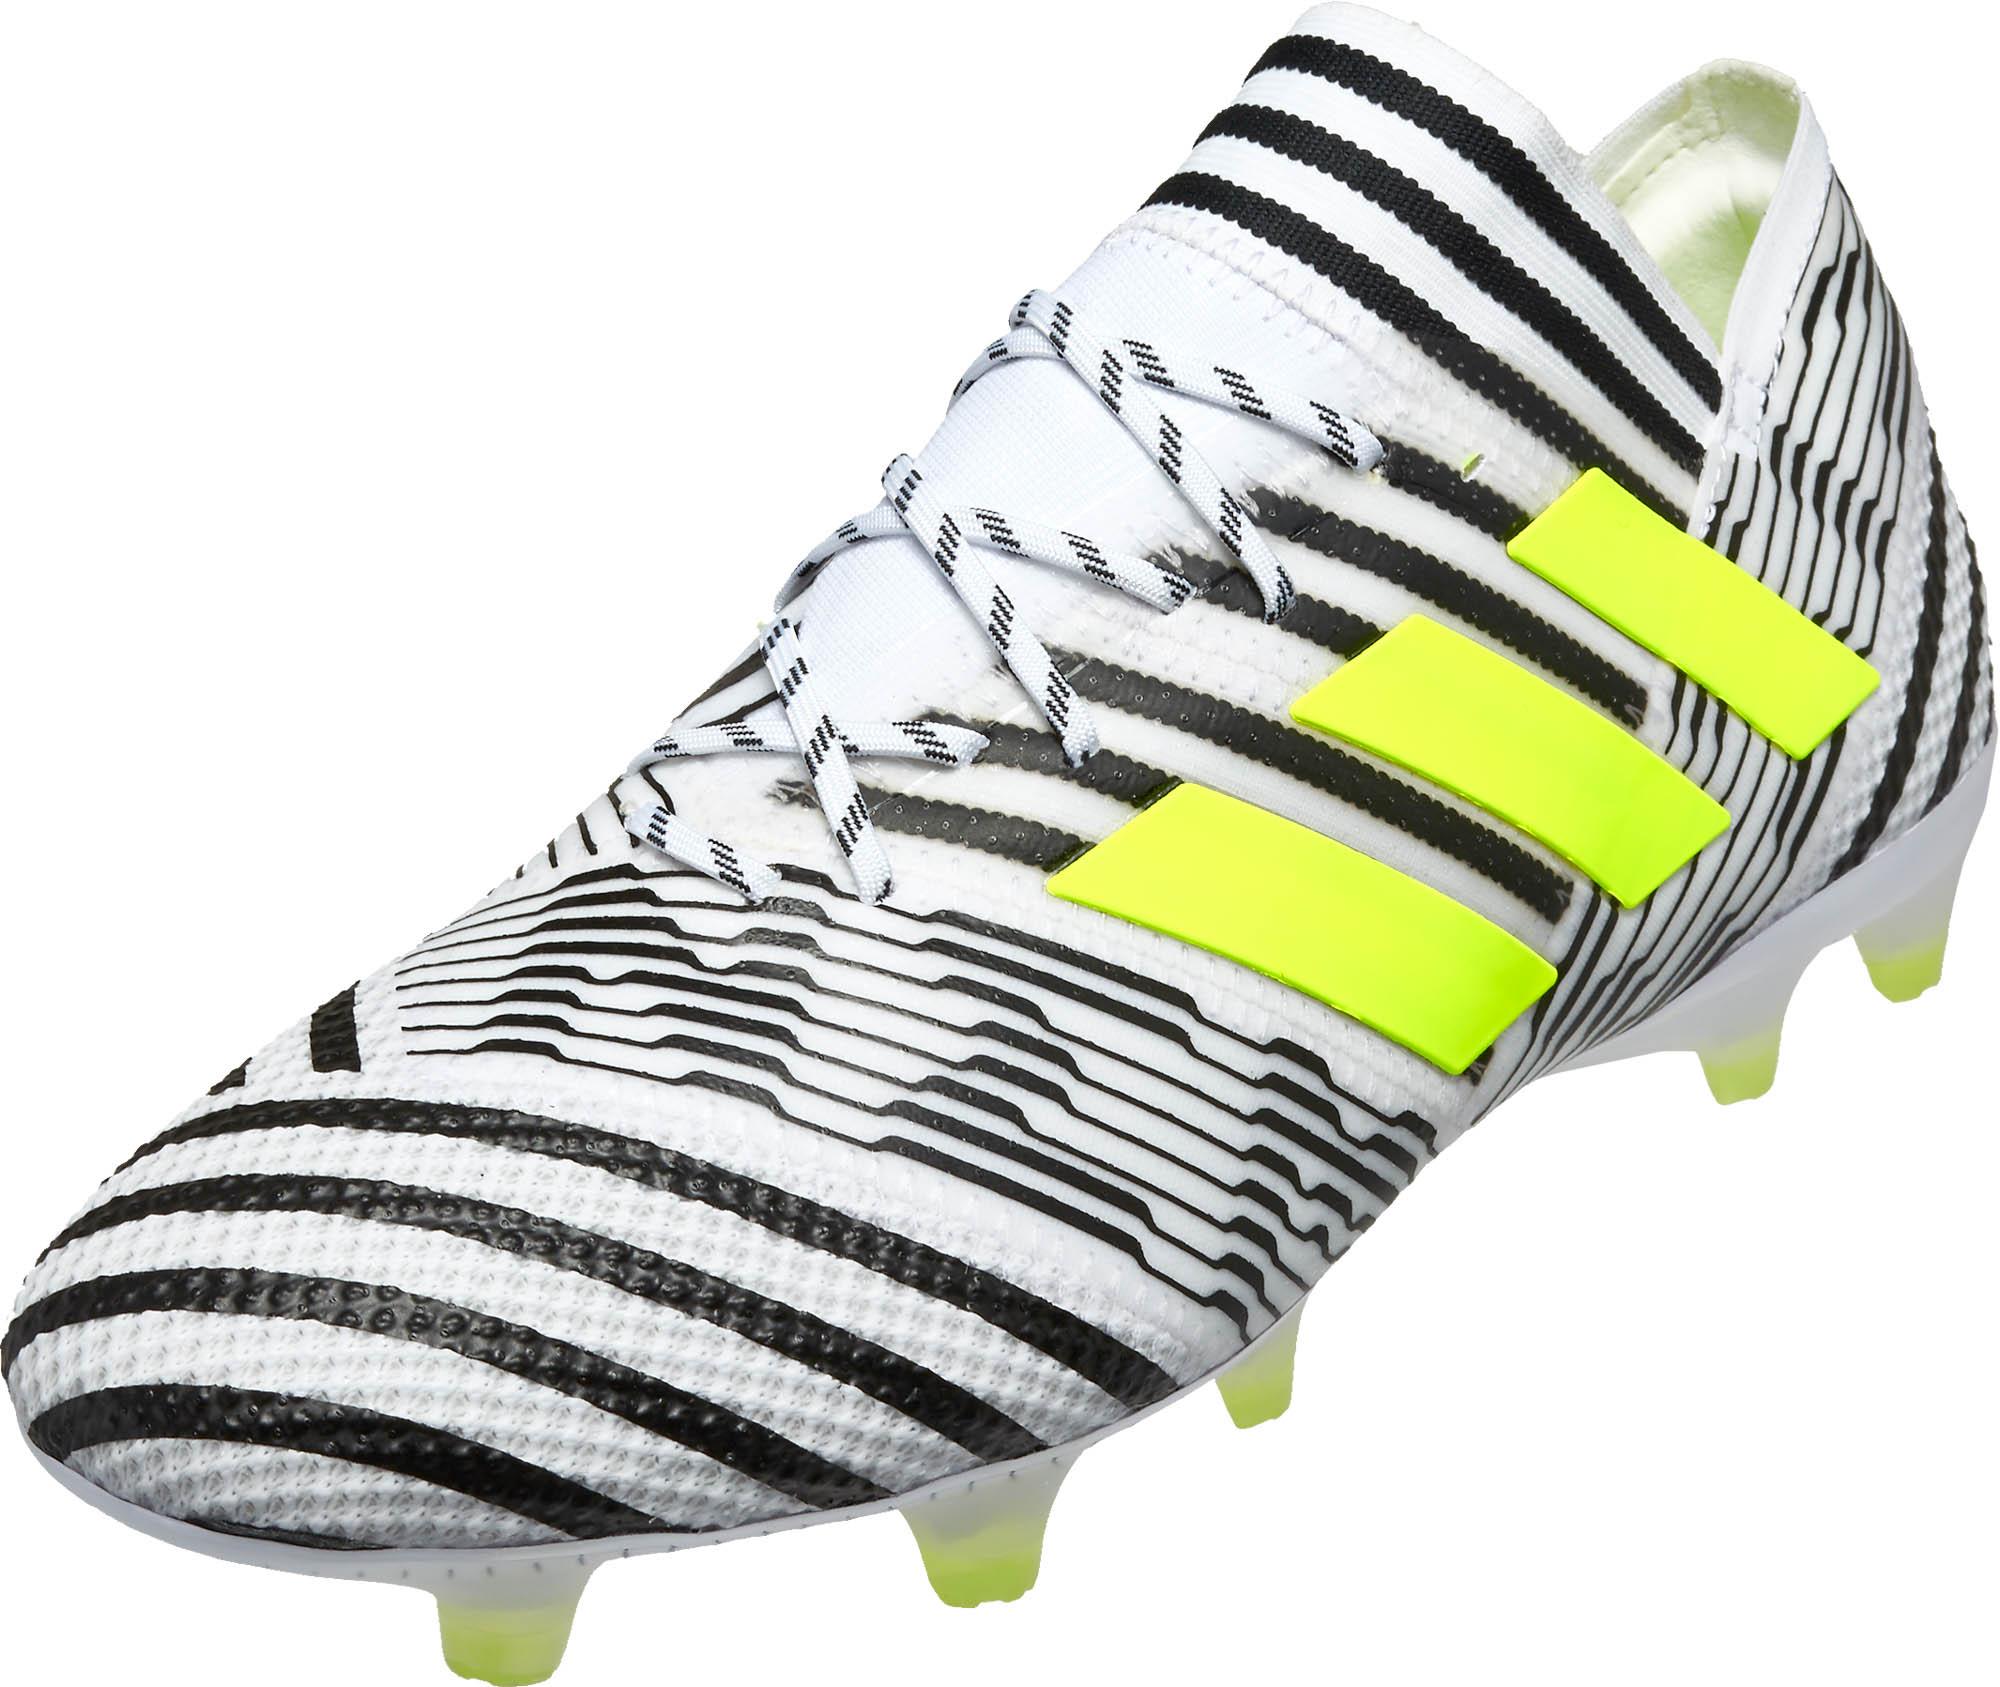 fe88f877e05f adidas Nemeziz 17.1 FG - White adidas Soccer Cleats